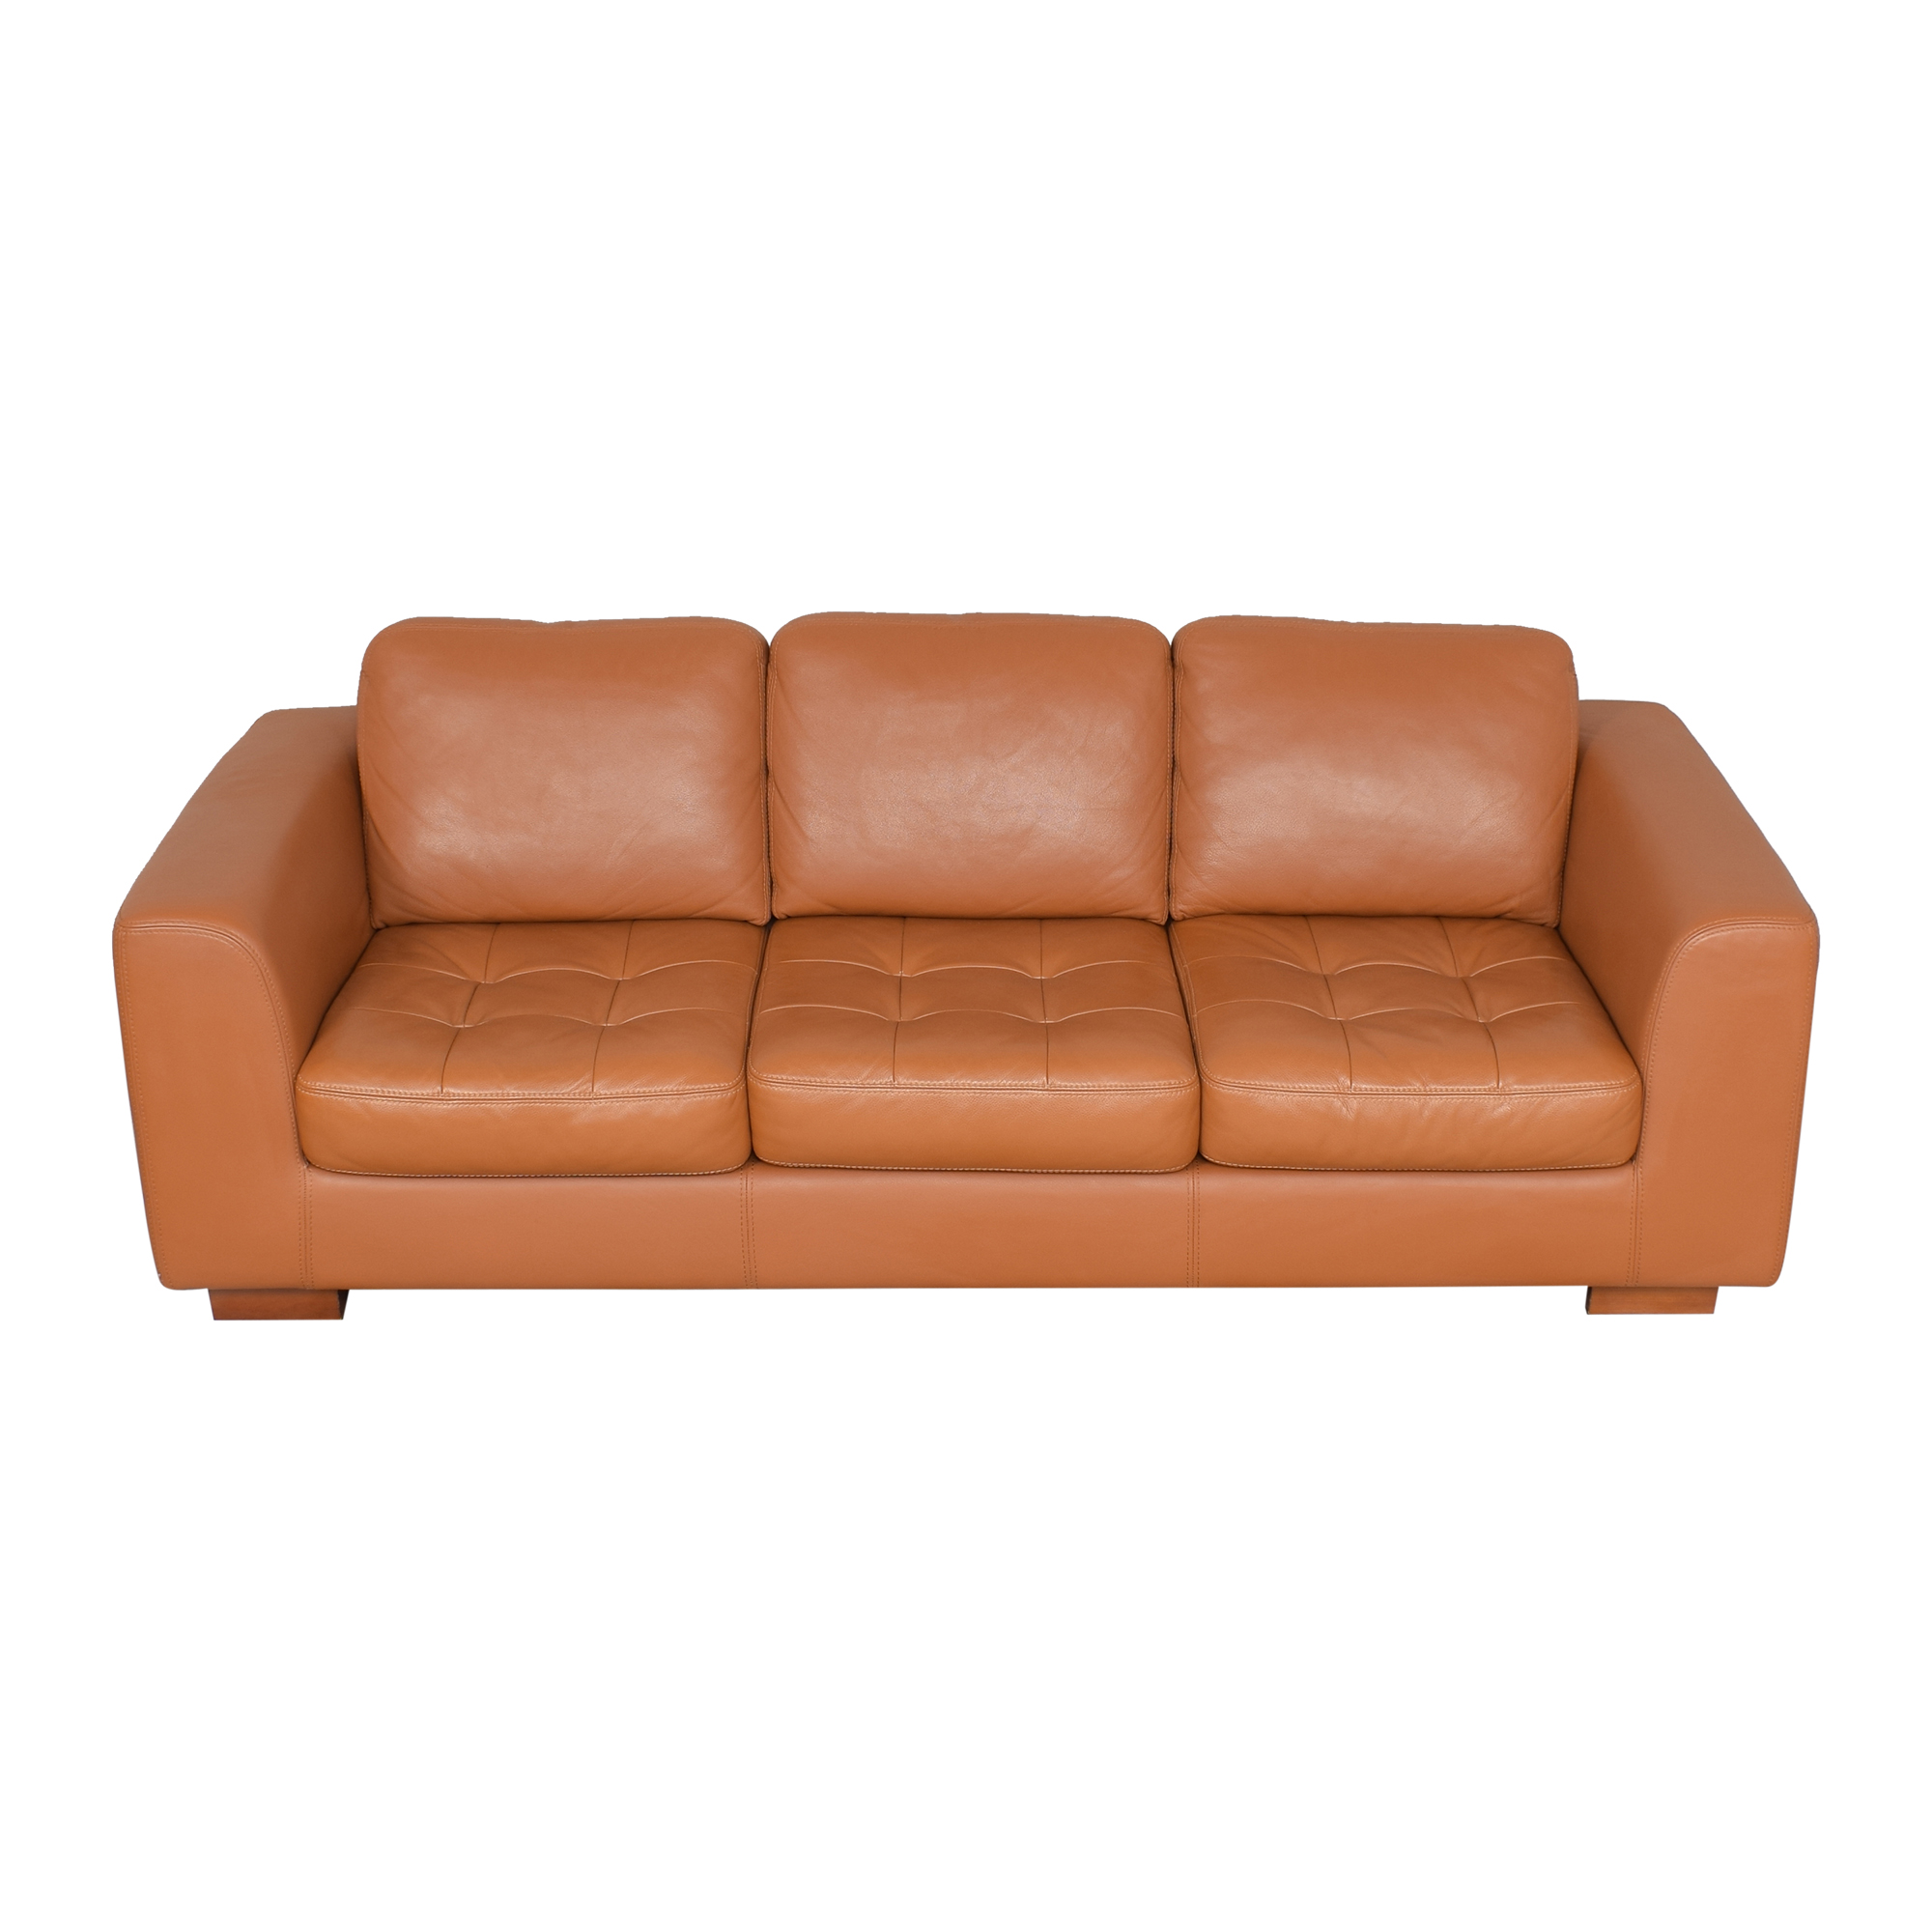 shop W. Schillig W. Schillig Three Cushion Sofa online